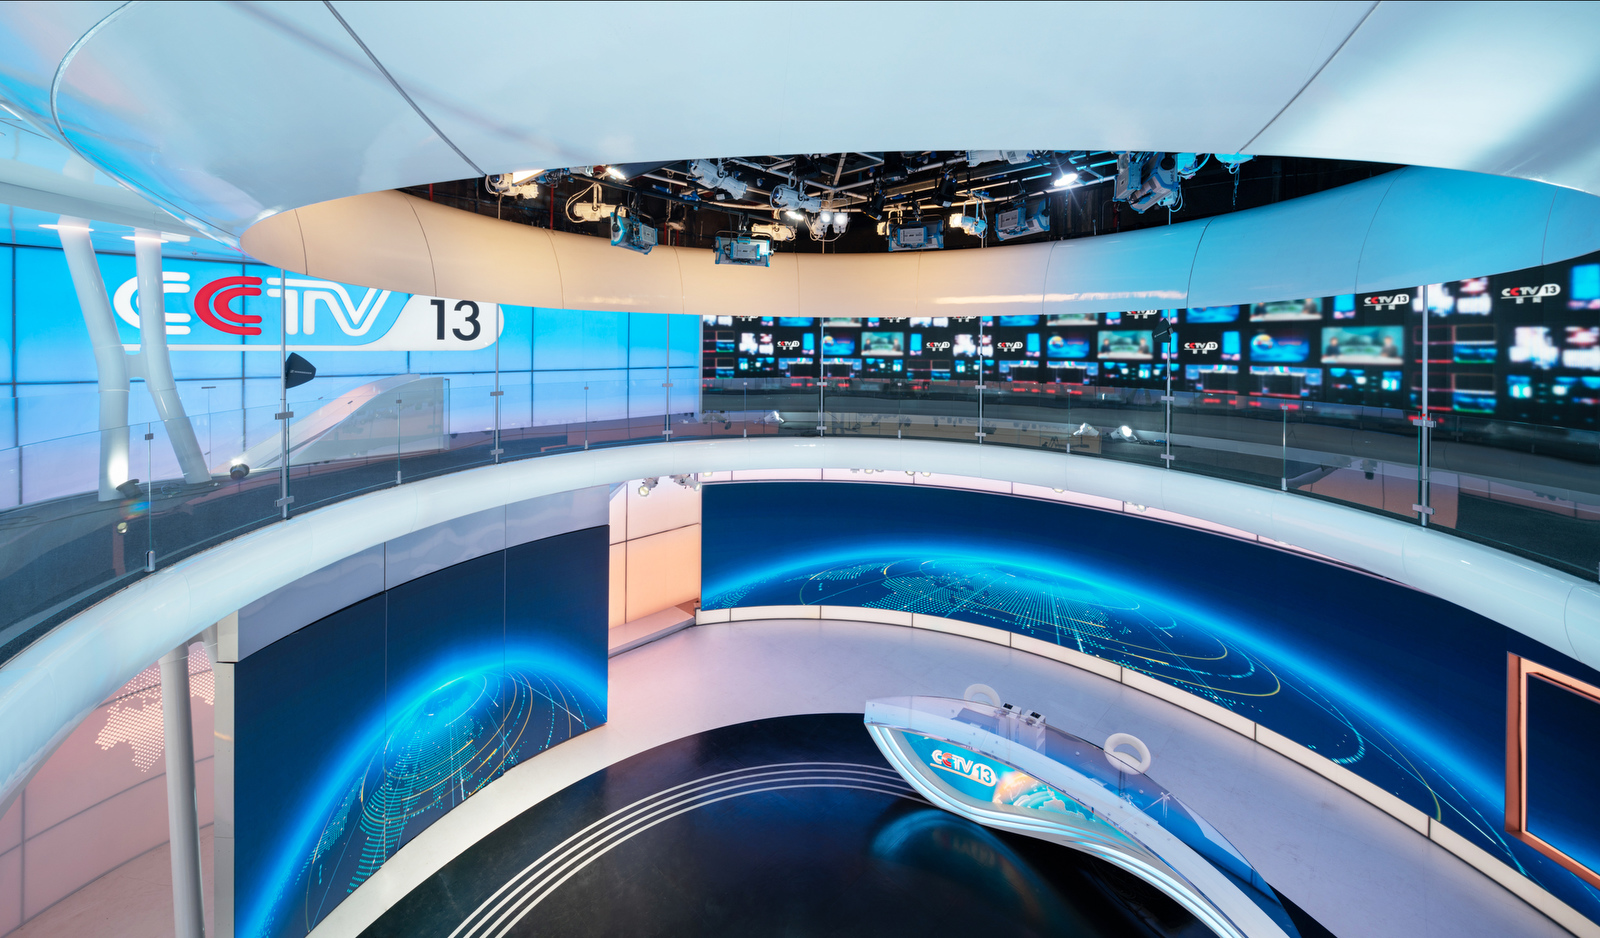 NCS_CCTV13-Set-Design_Clickspring_0002